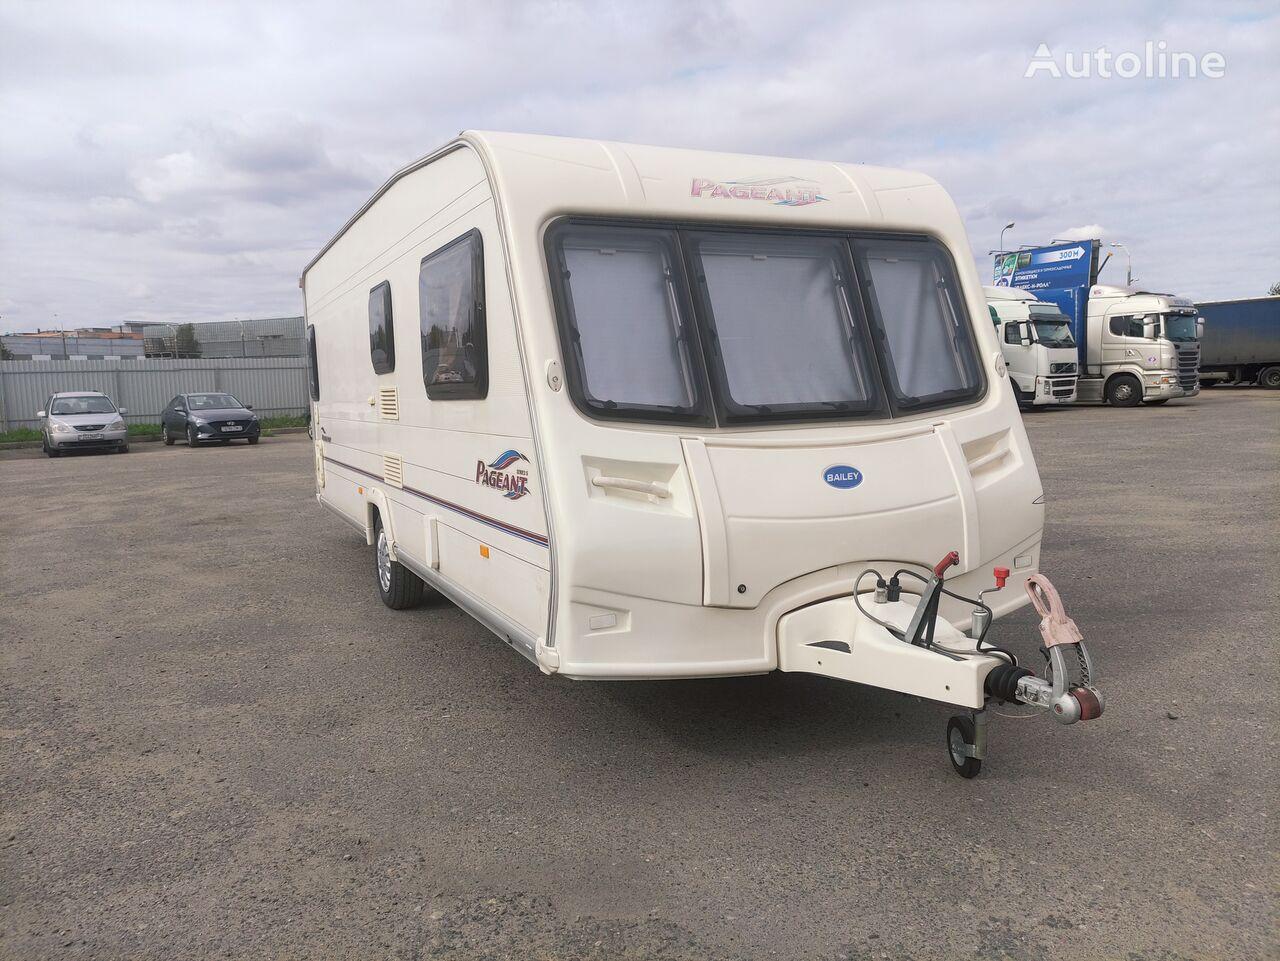 BAILEY PAGEANT BURGUNDY caravan trailer